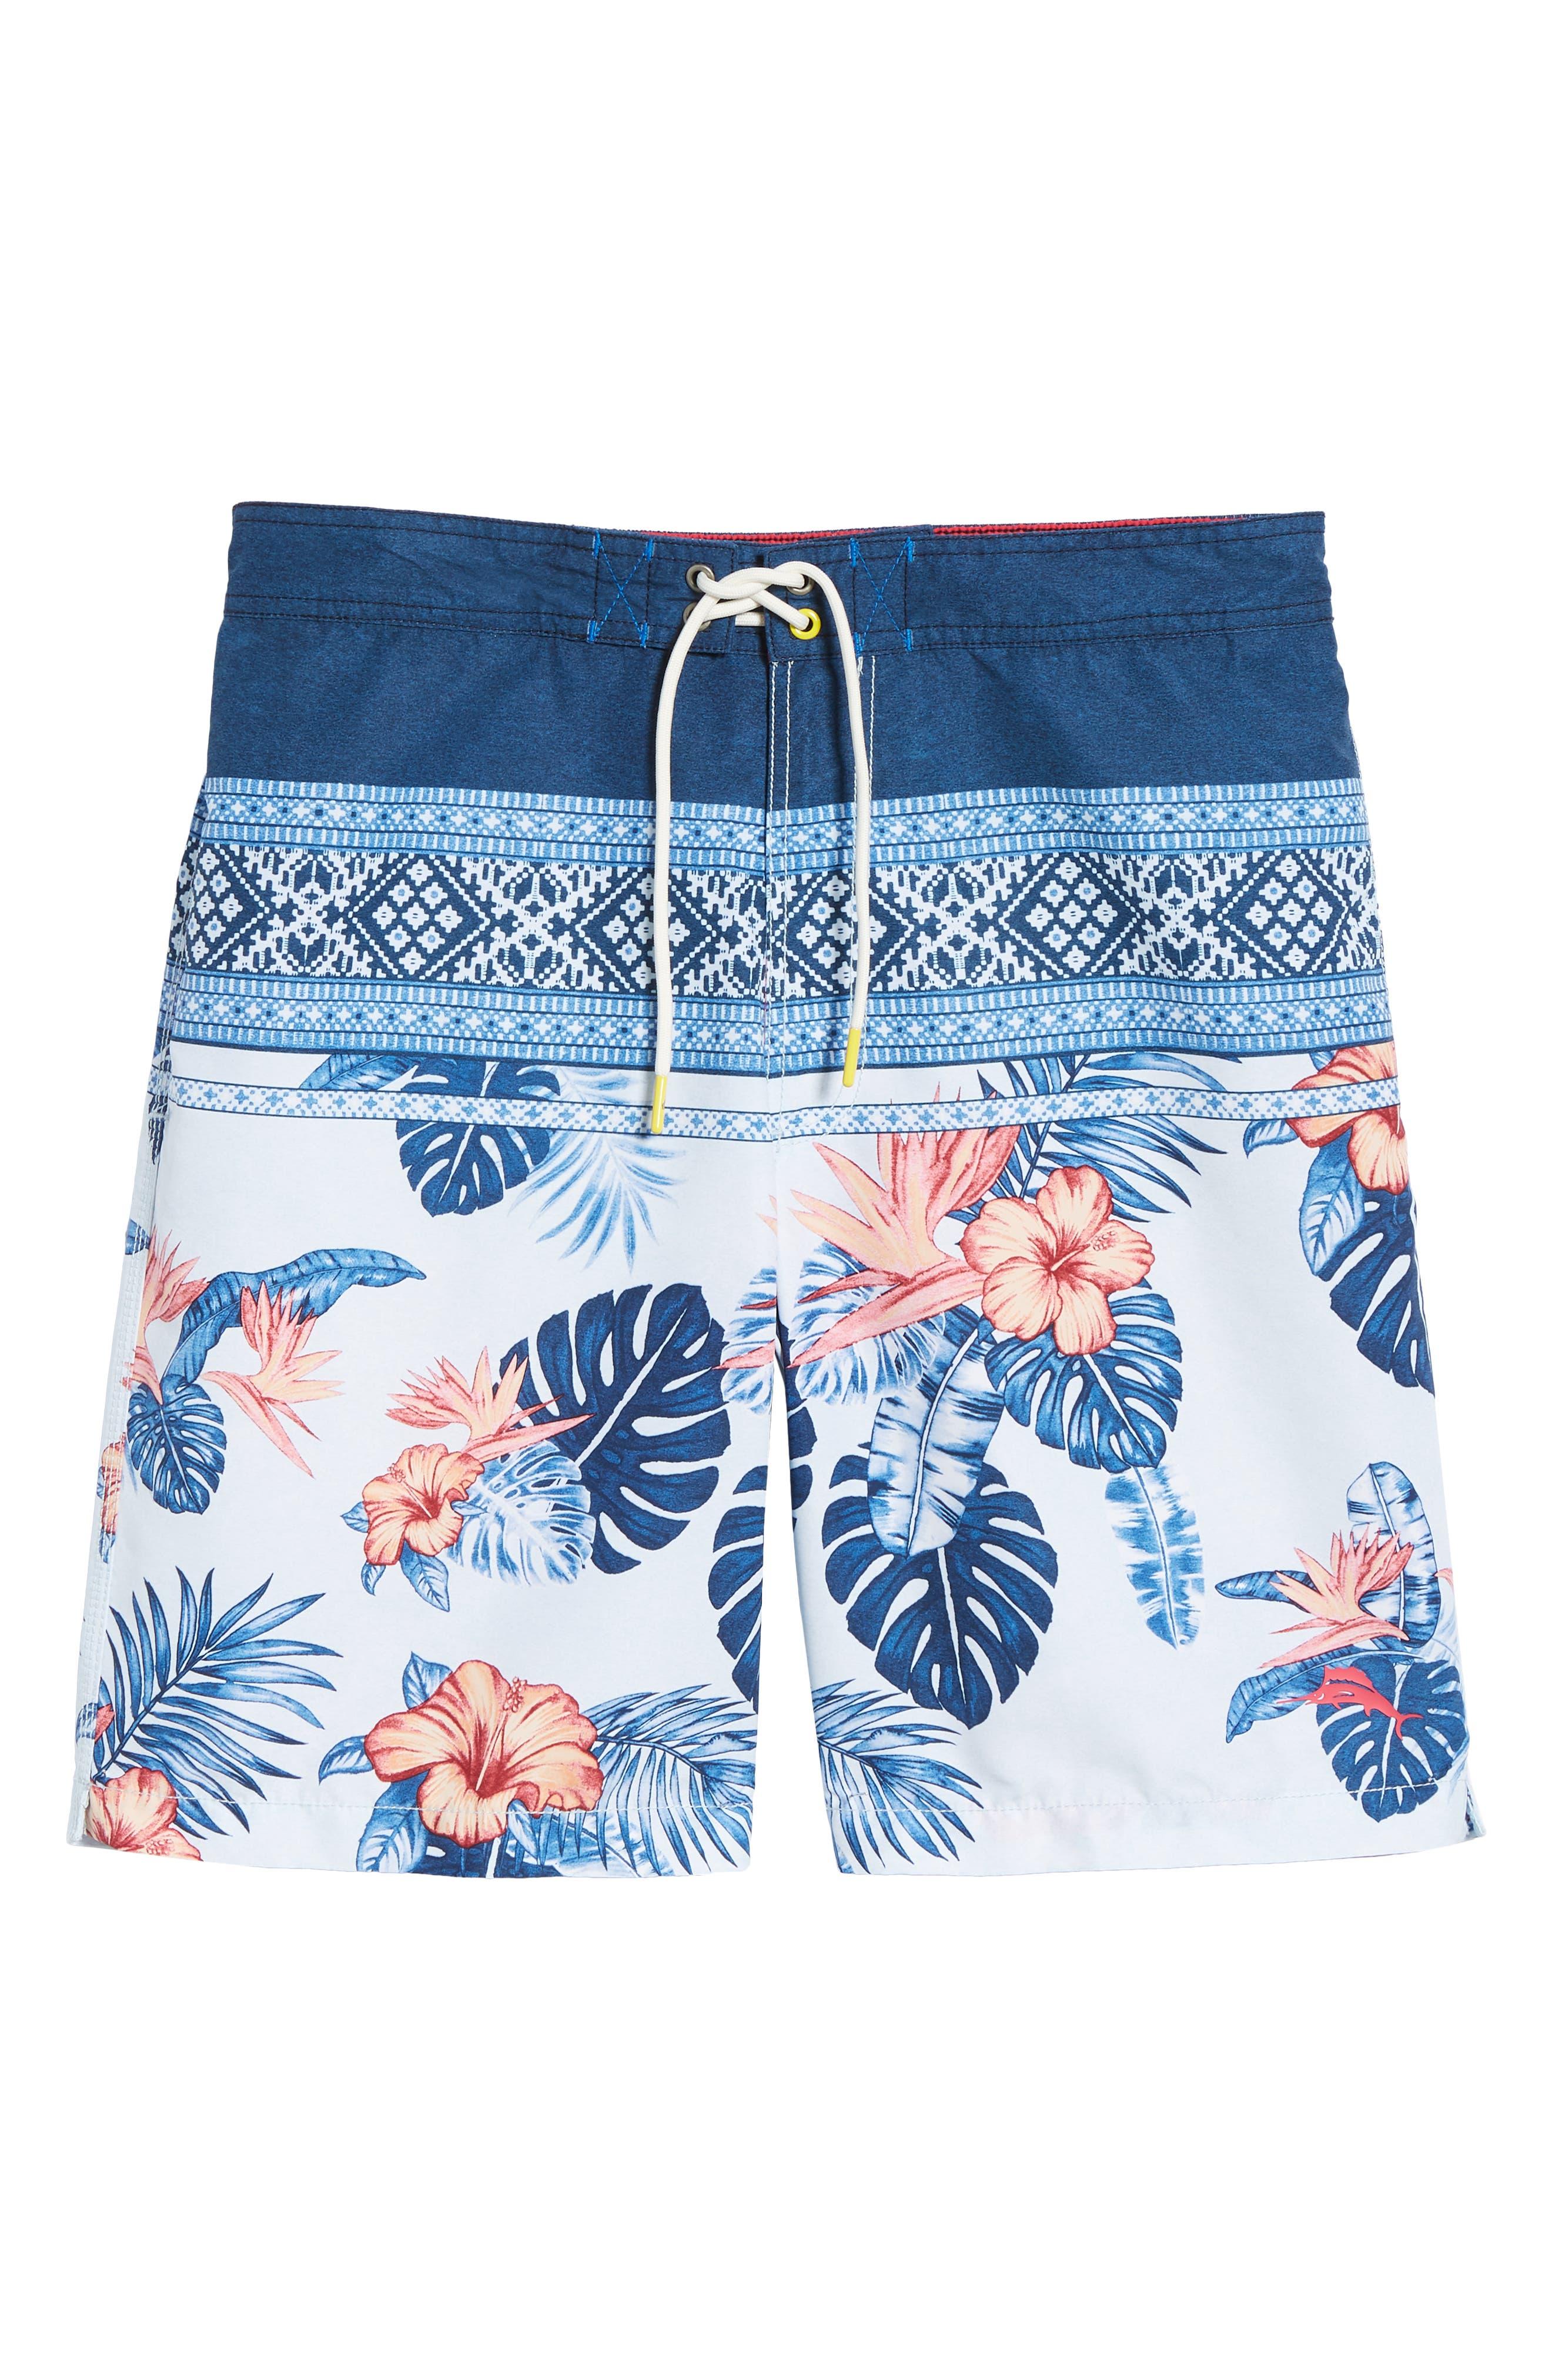 Baja Casa Rosa Board Shorts,                             Alternate thumbnail 6, color,                             Mountain Bluebell